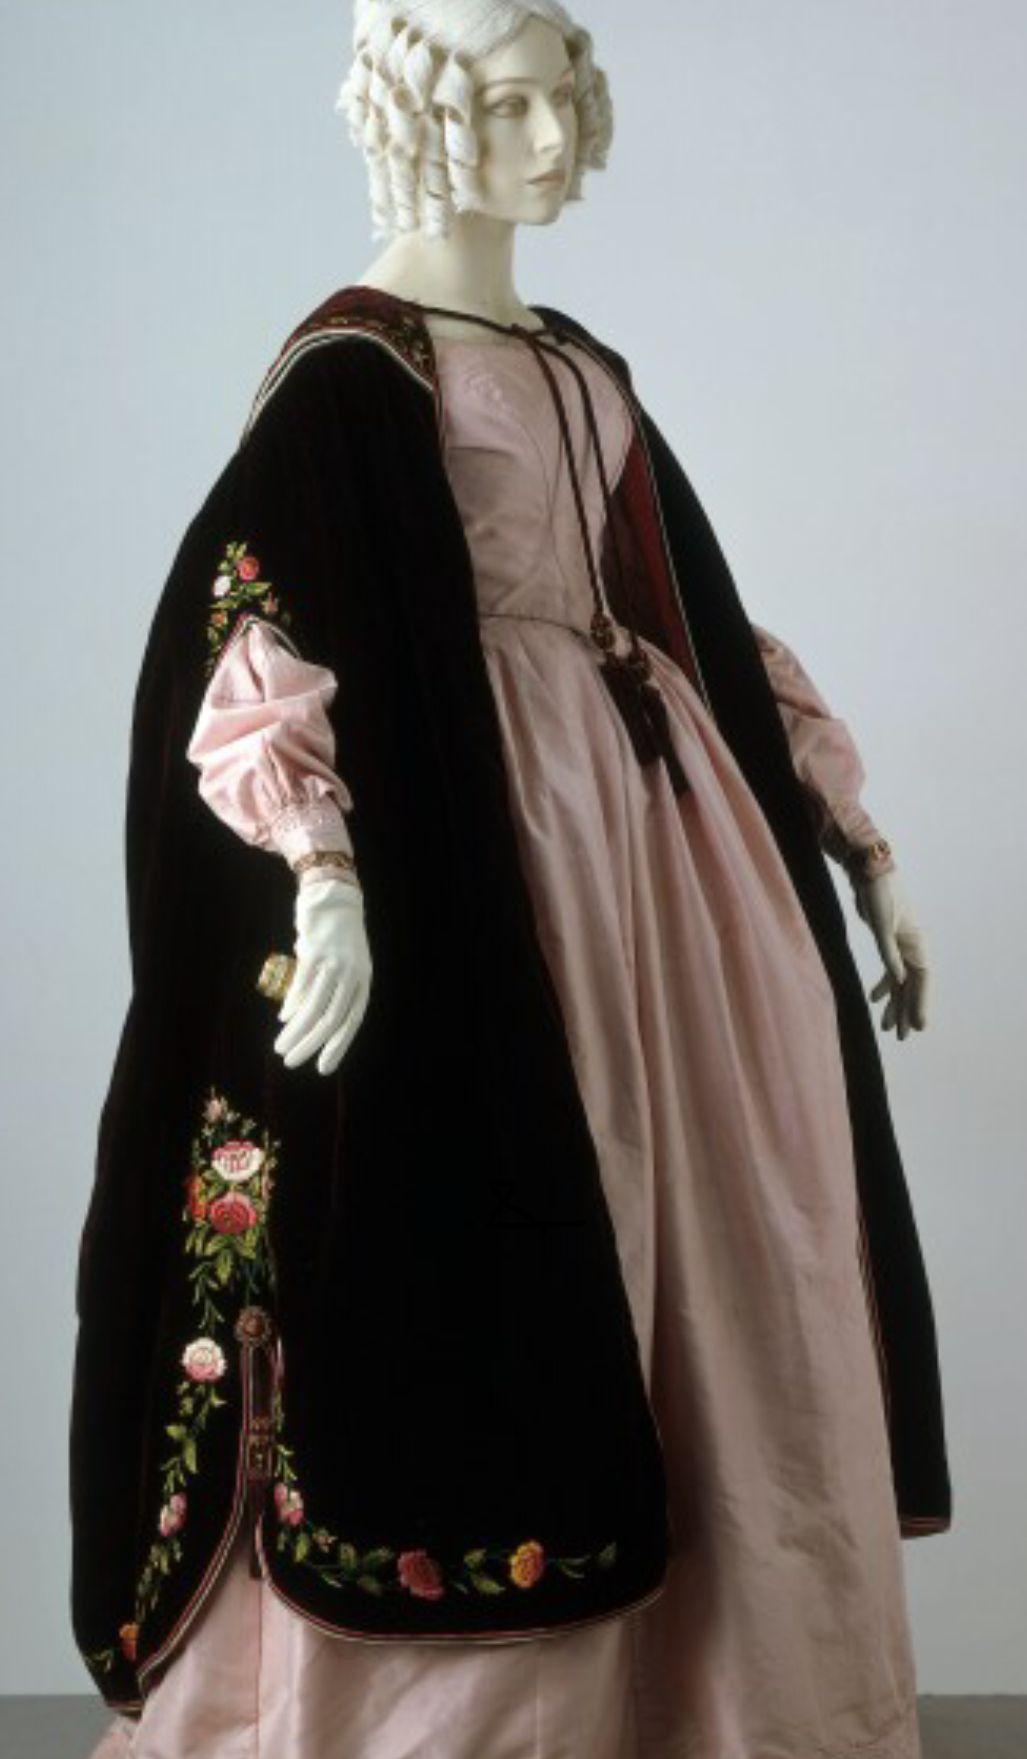 Pin by regina gschladt on coats jackets inspiration - Viktorianische mobel ...